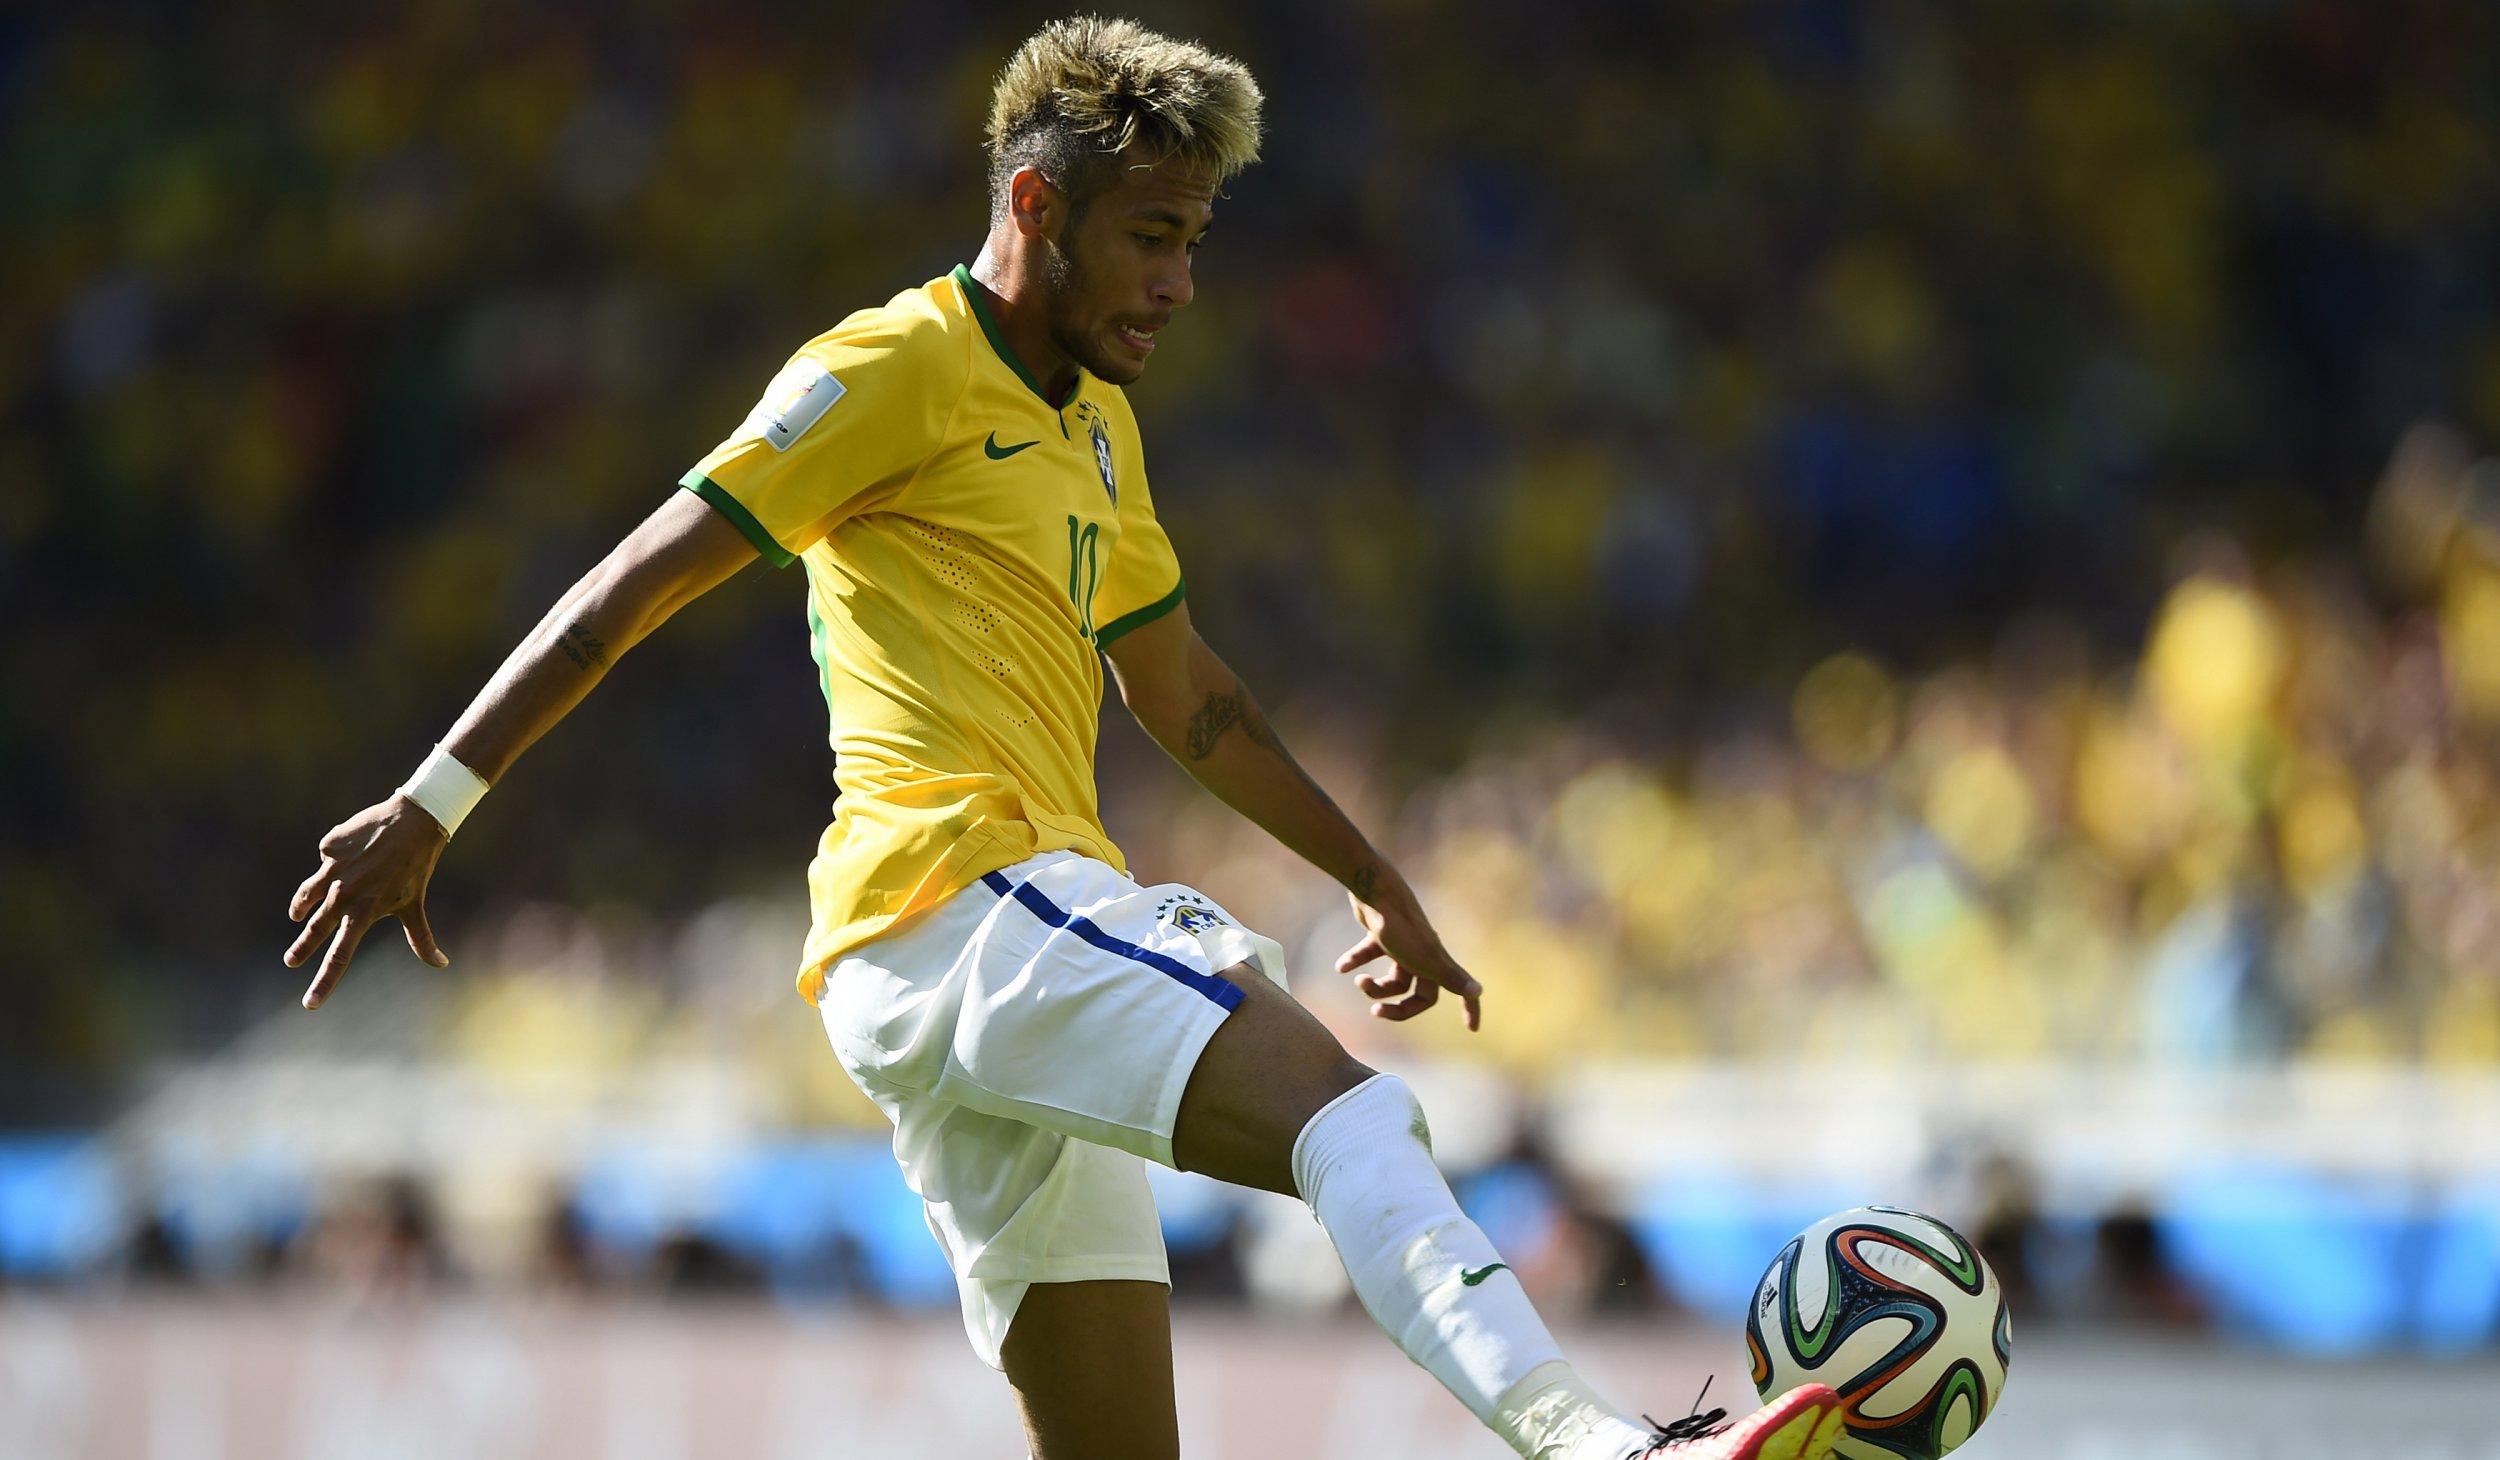 Neymar kick